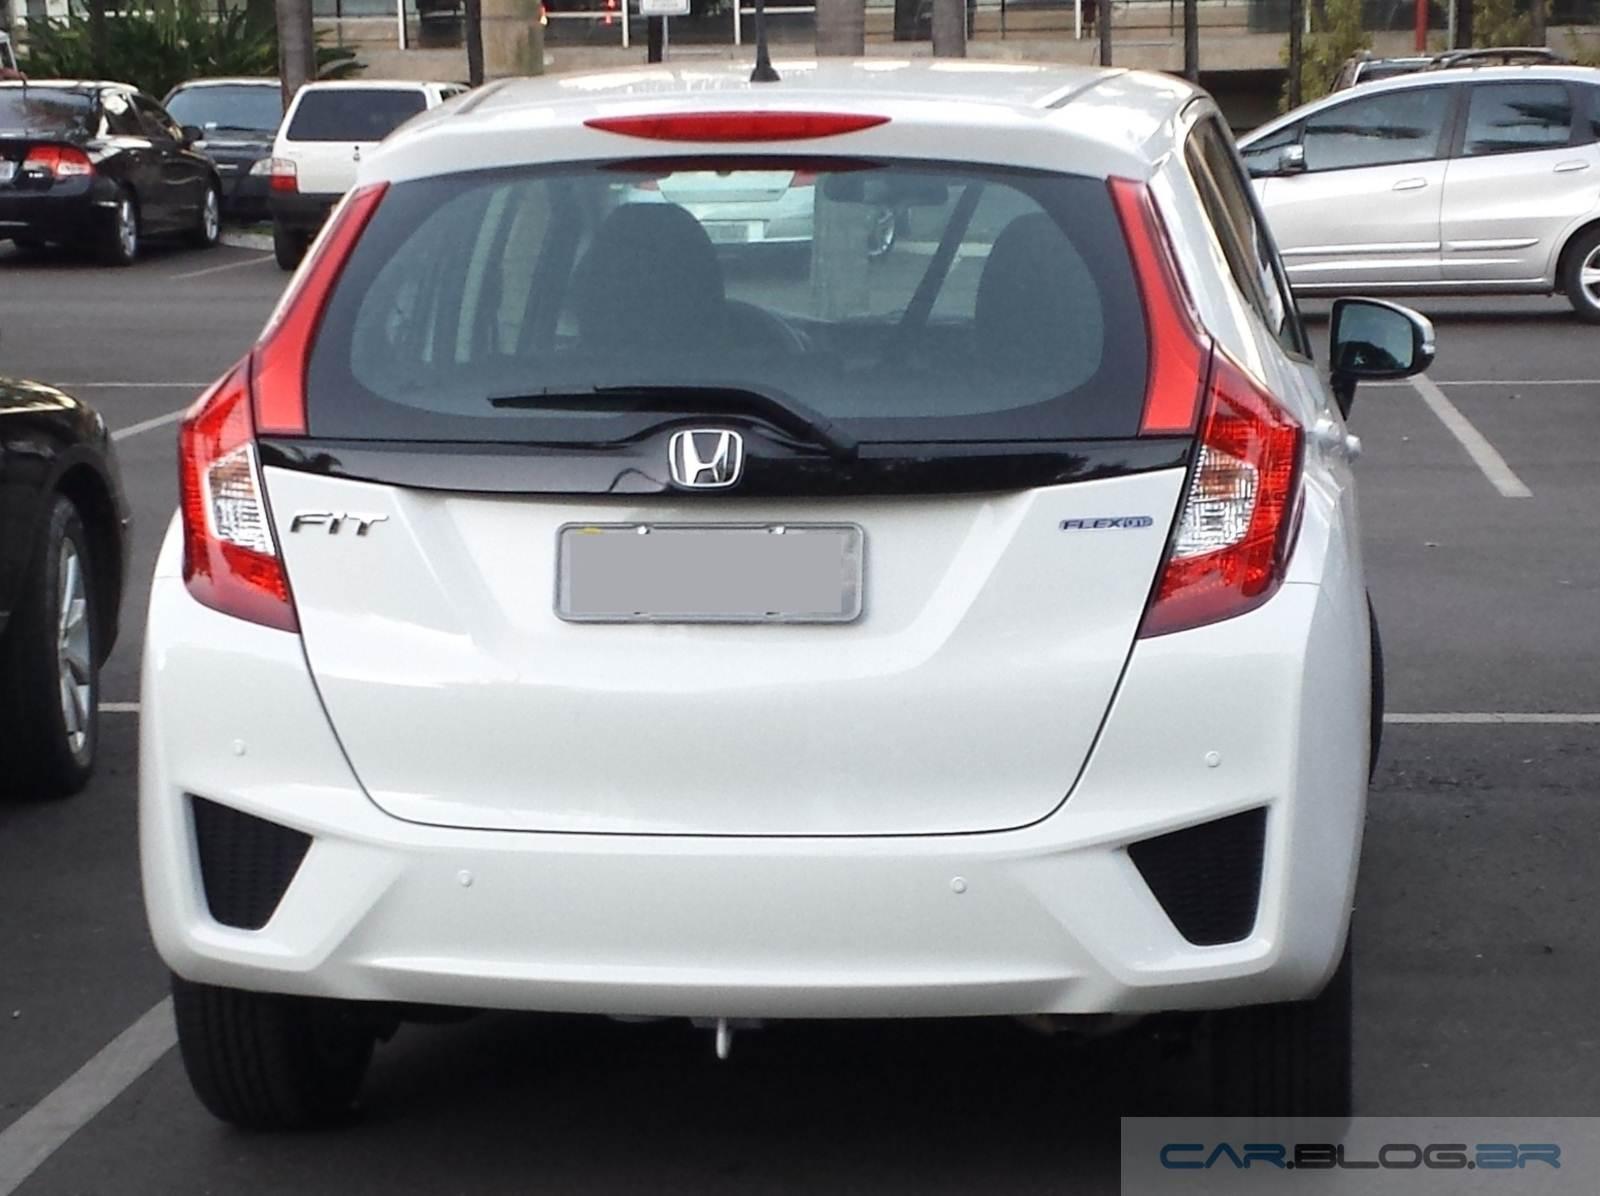 Lovely Novo Honda Fit LX CVT Automático 2015